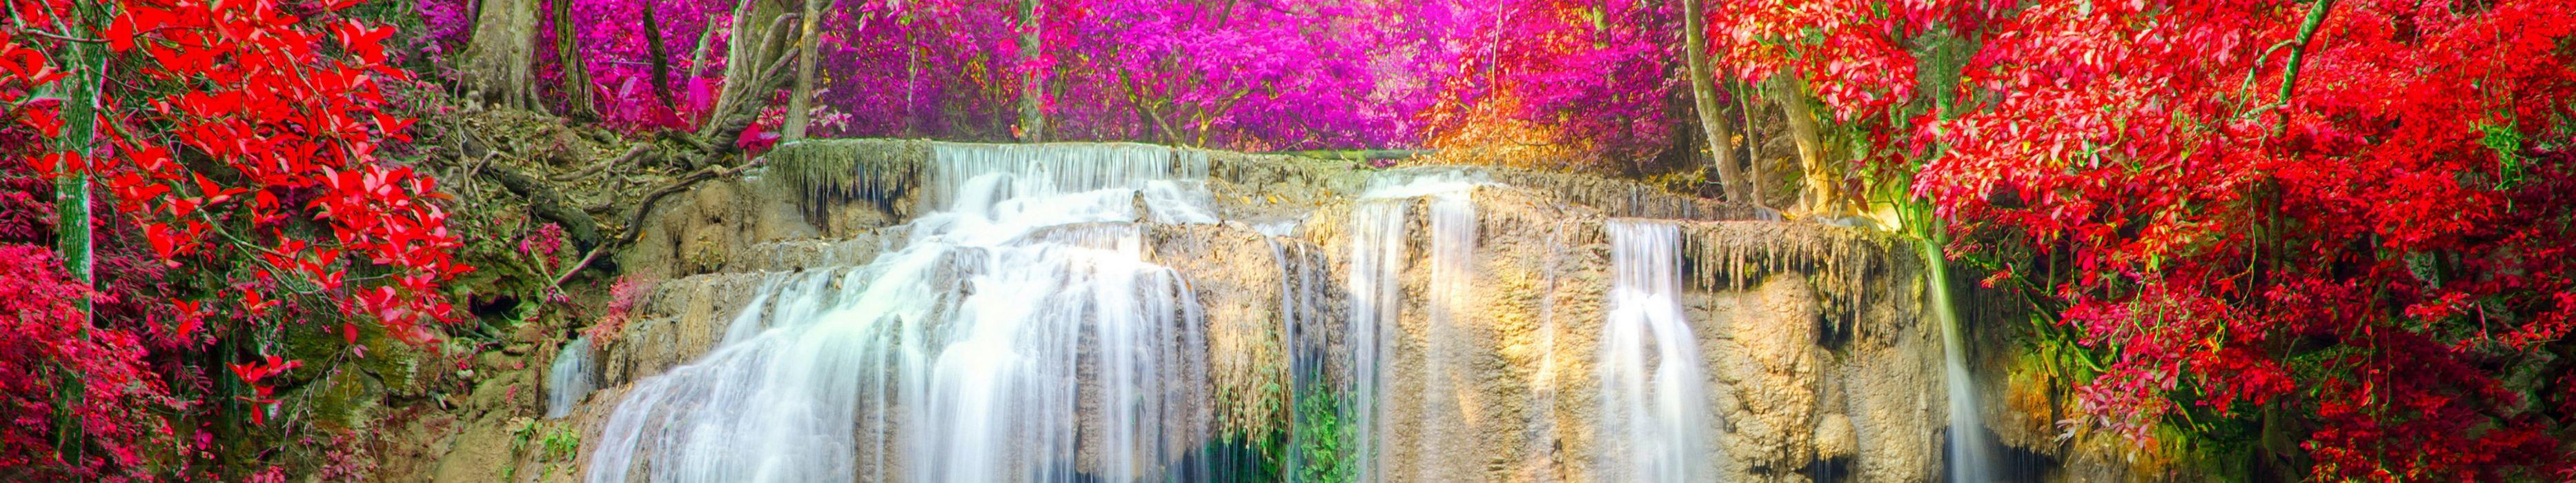 triple monitor multi multiple screen chute paysage nature waterfall wallpaper